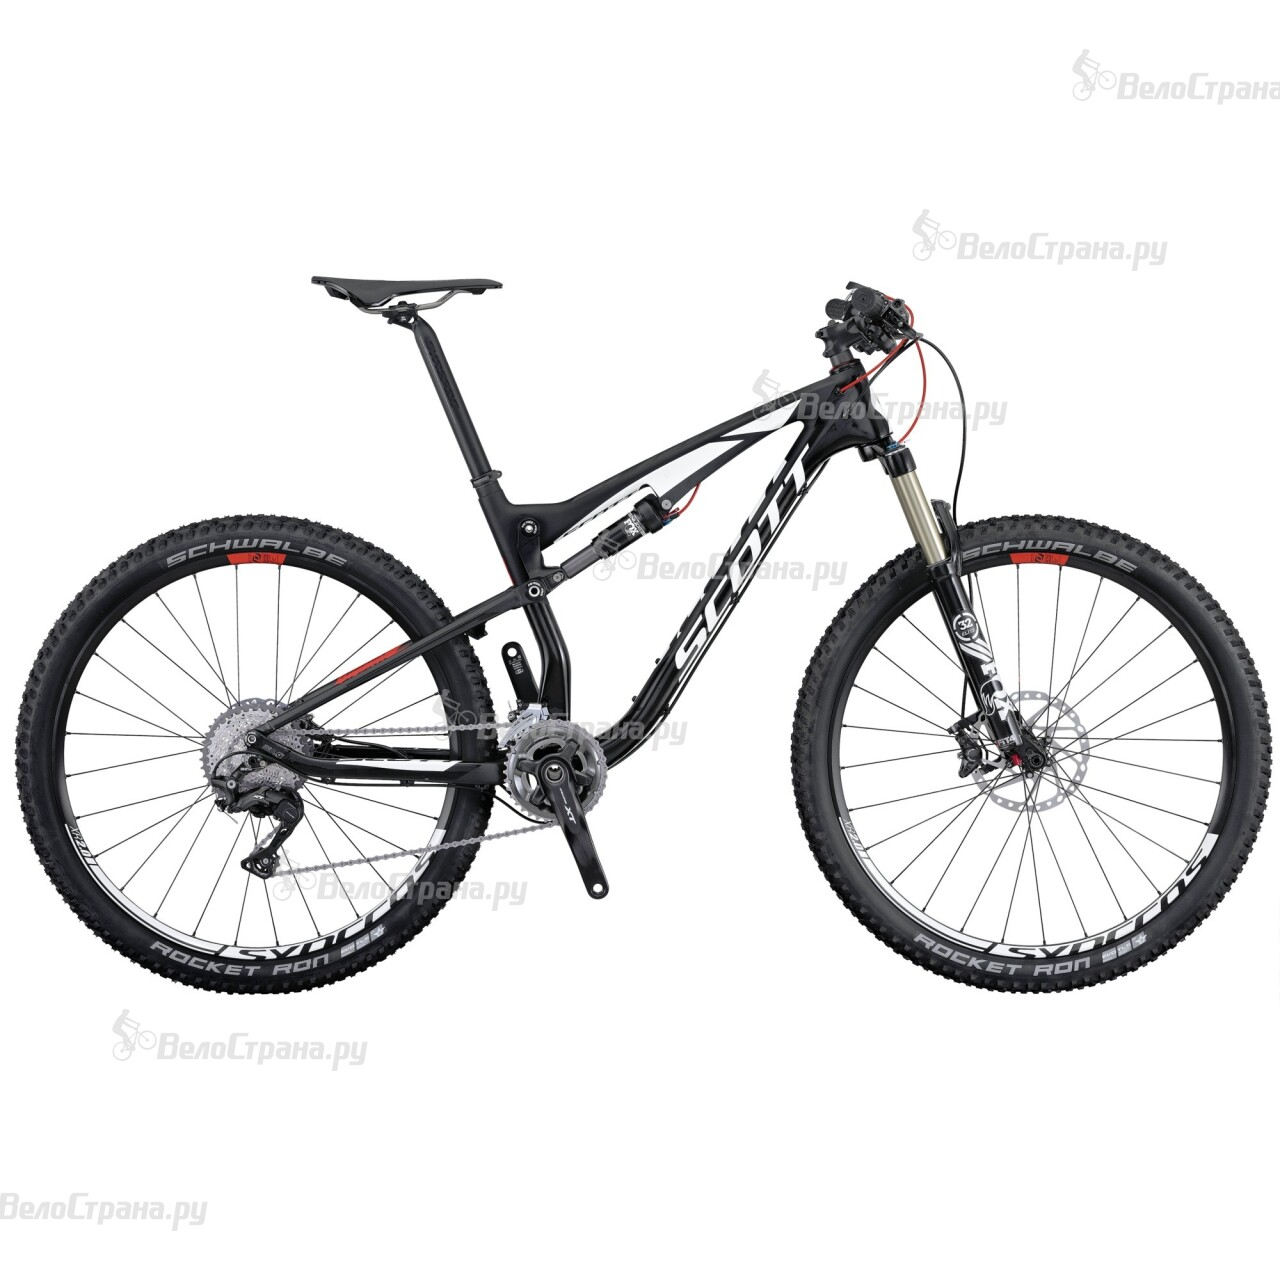 Велосипед Scott Spark 710 (2016) пентэласт 710 в костанае